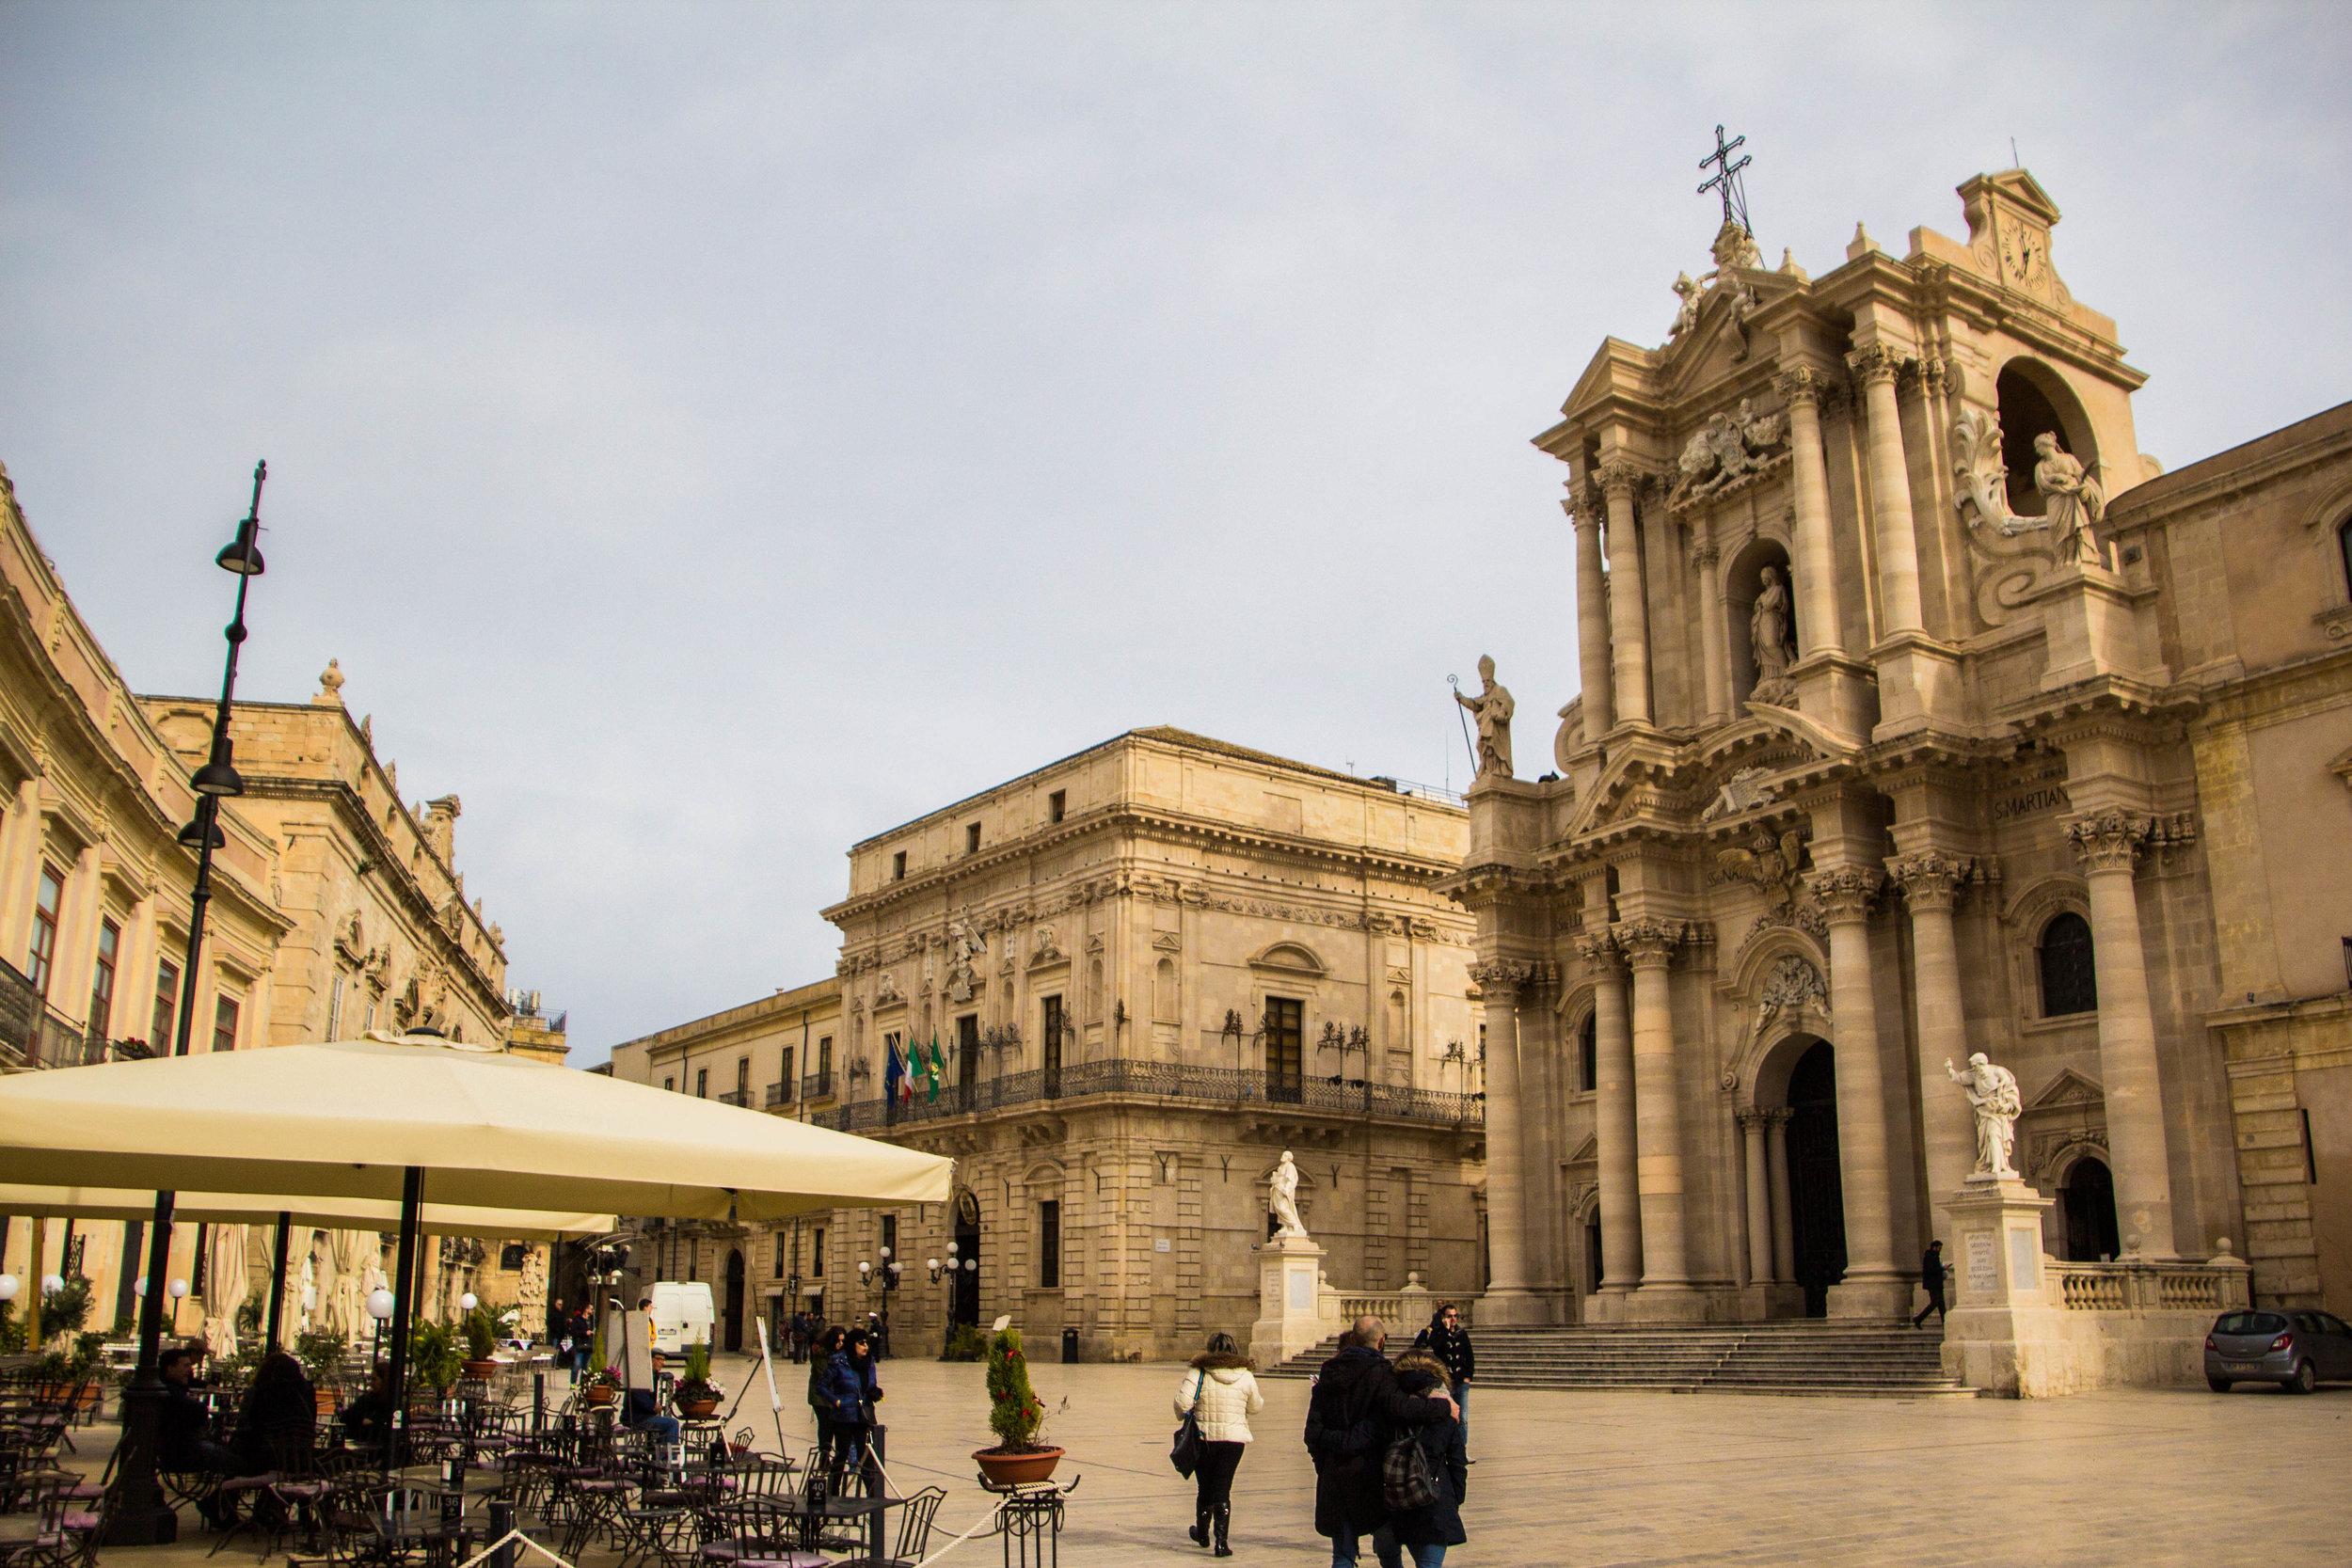 piazza-duomo-ortygia-syracuse-sicily-10.jpg